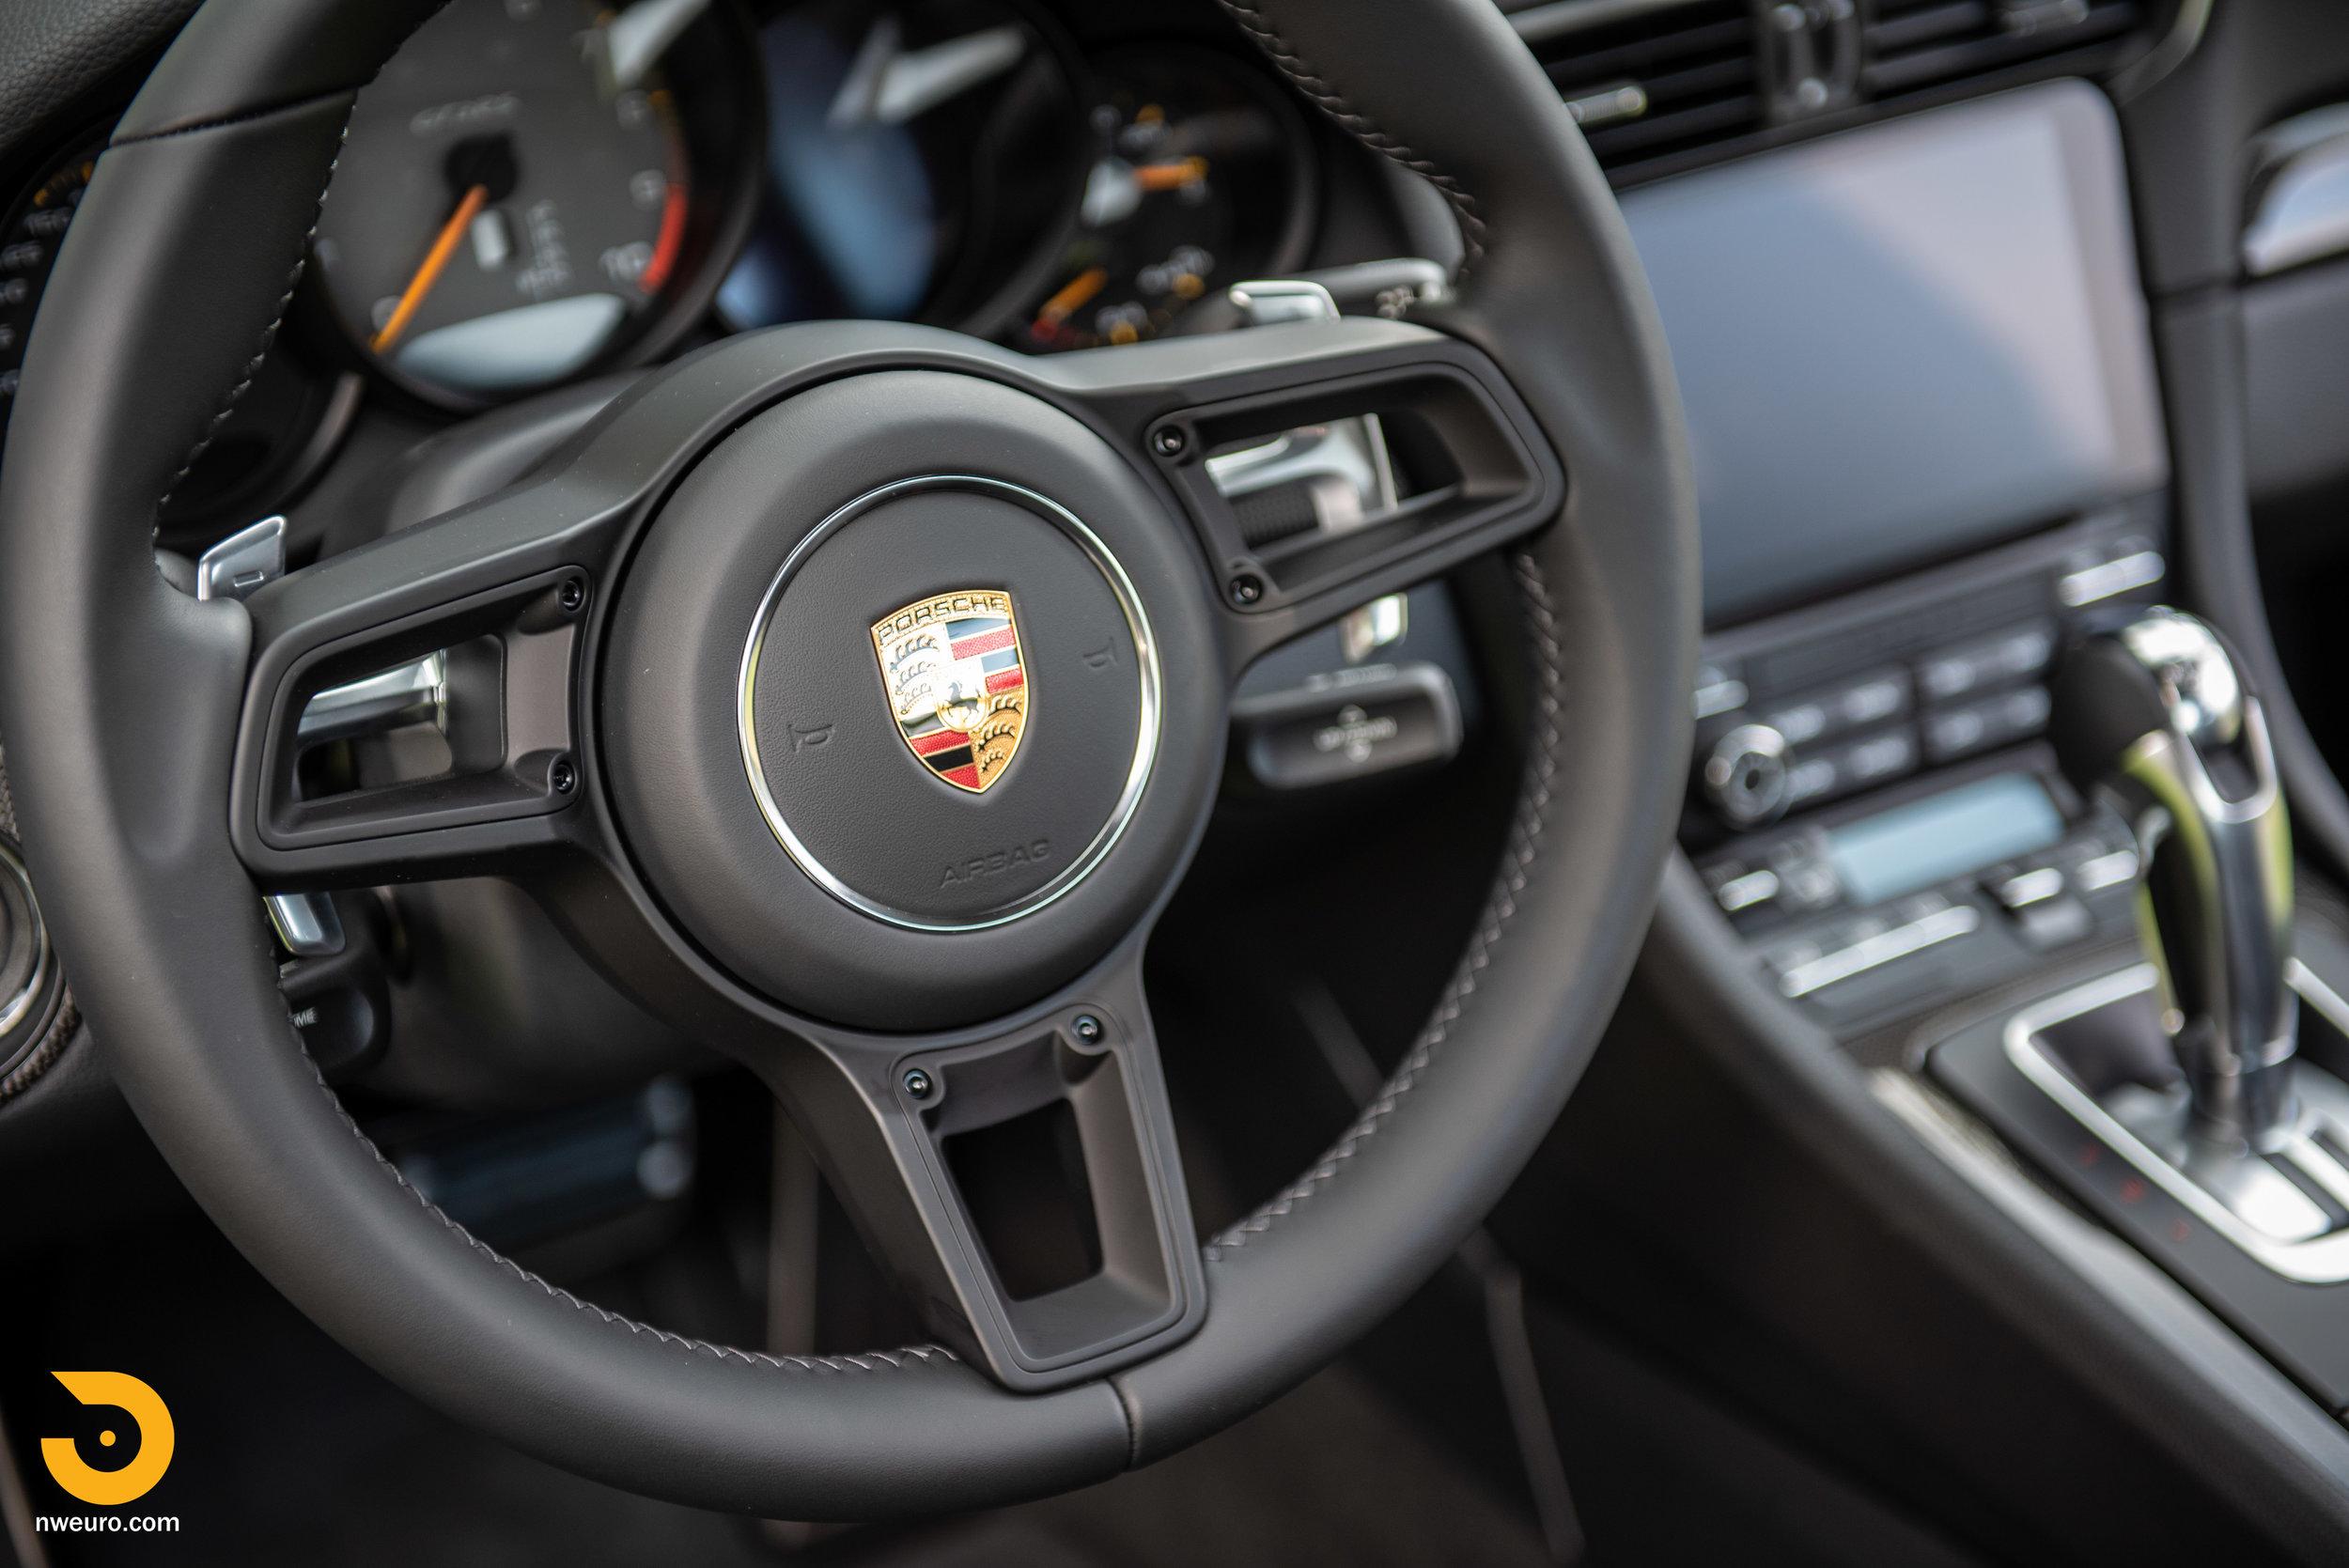 2019 Porsche GT3 RS - Chalk-45.jpg